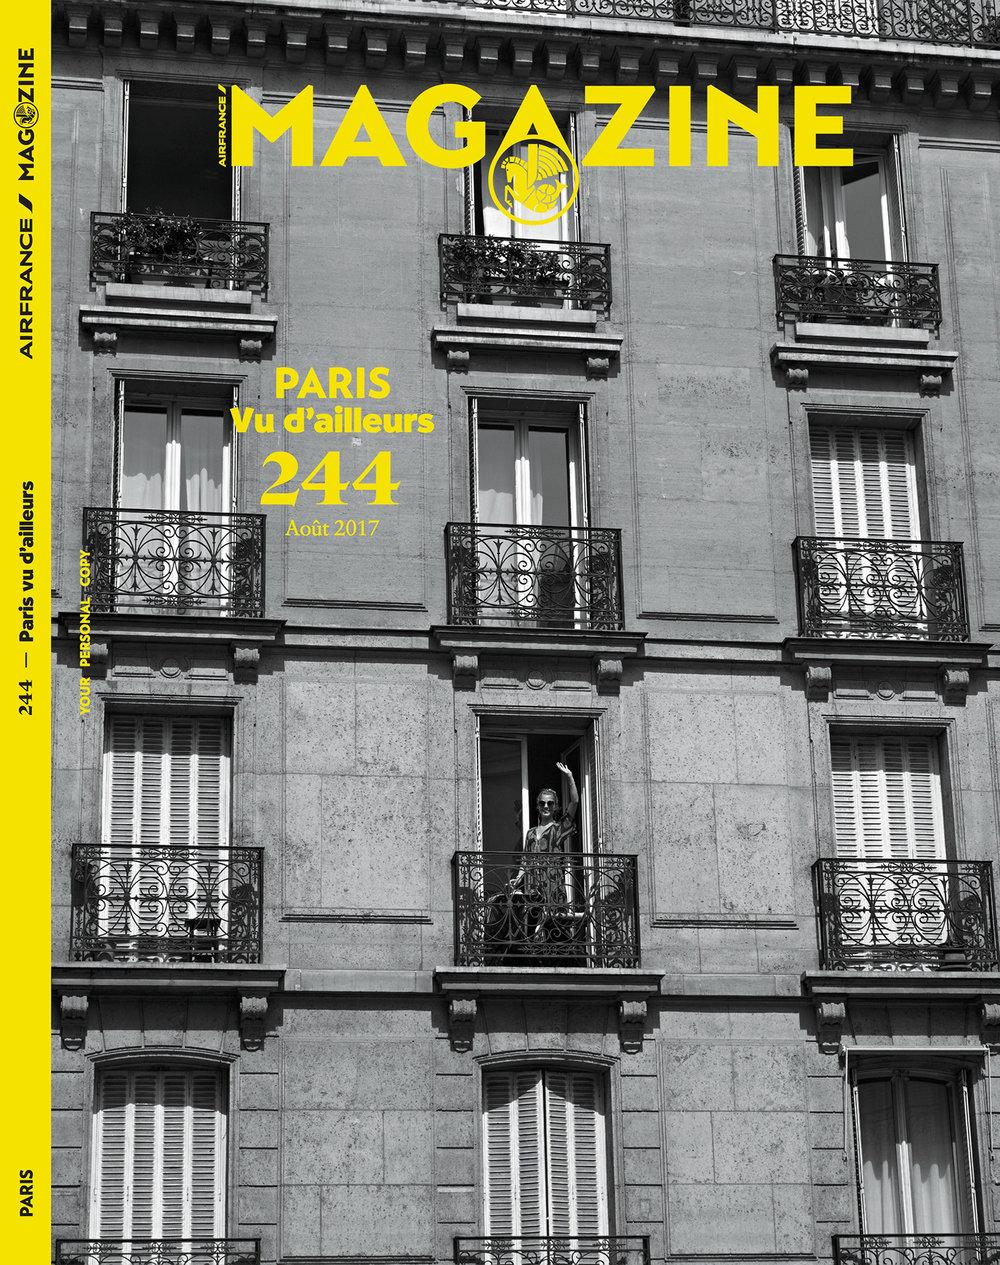 Air France Magazine, August 2017